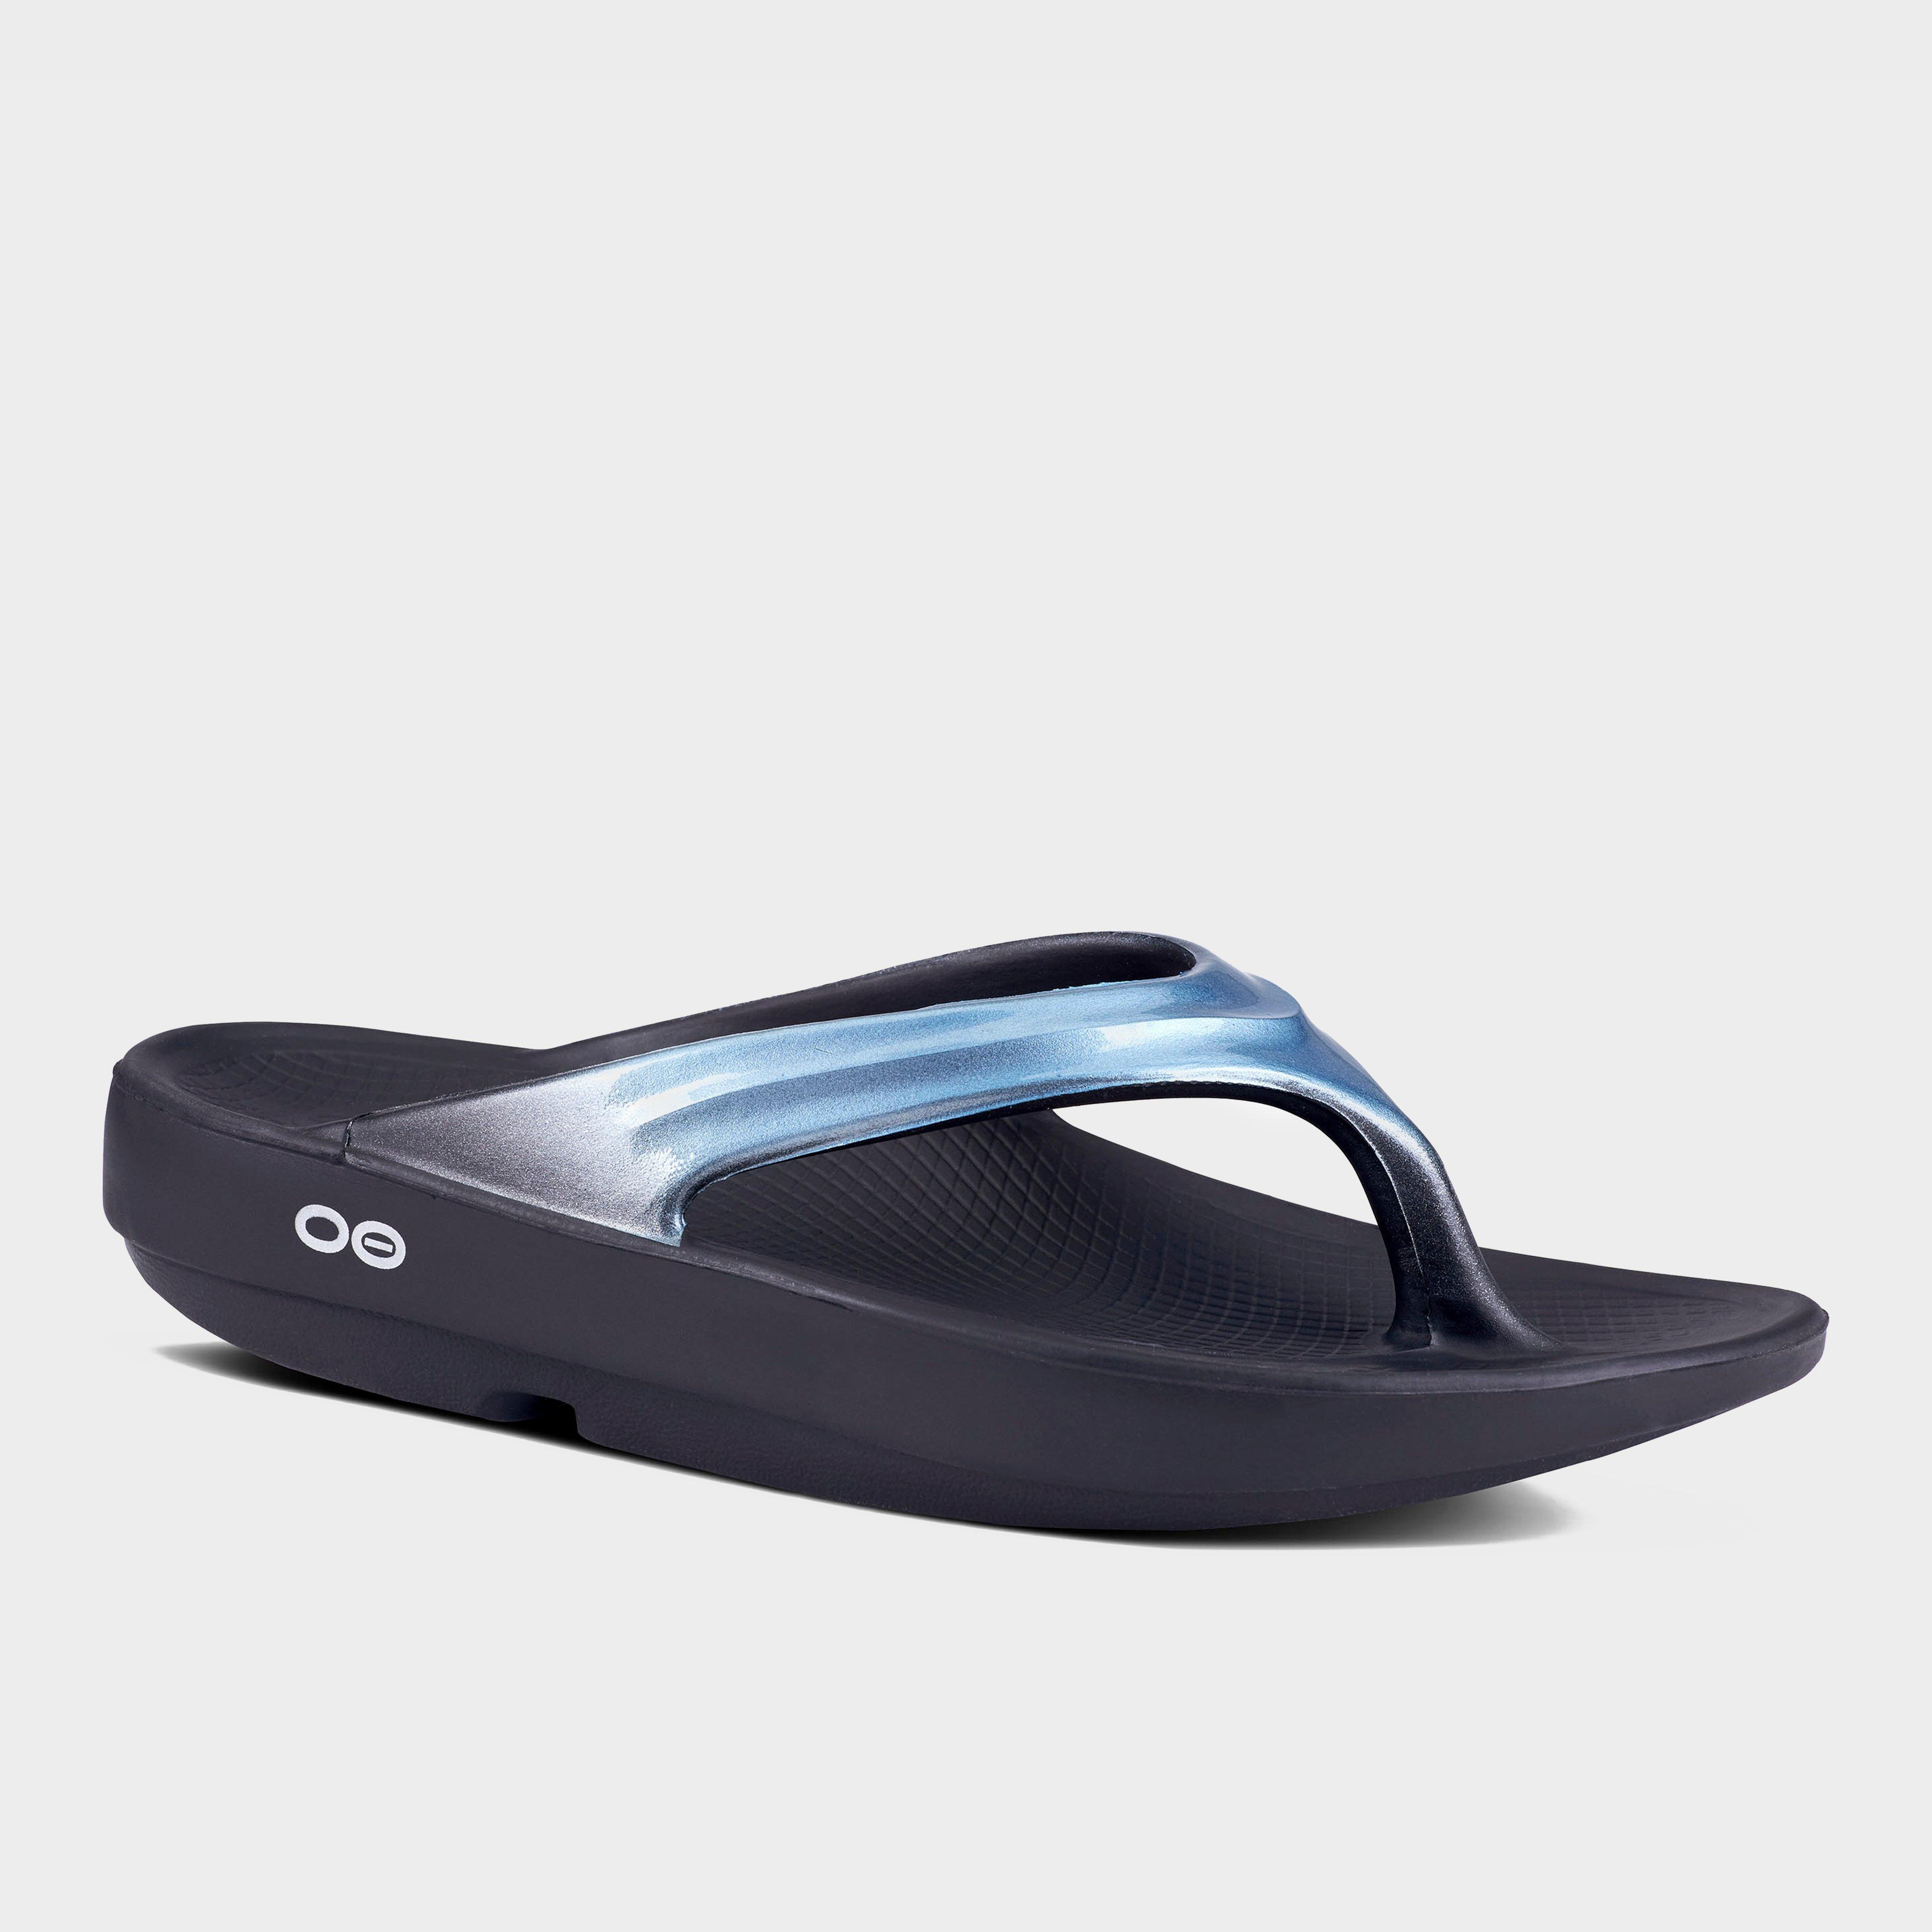 Oofos Oofos Womens OOlala Flip Flops, Blue